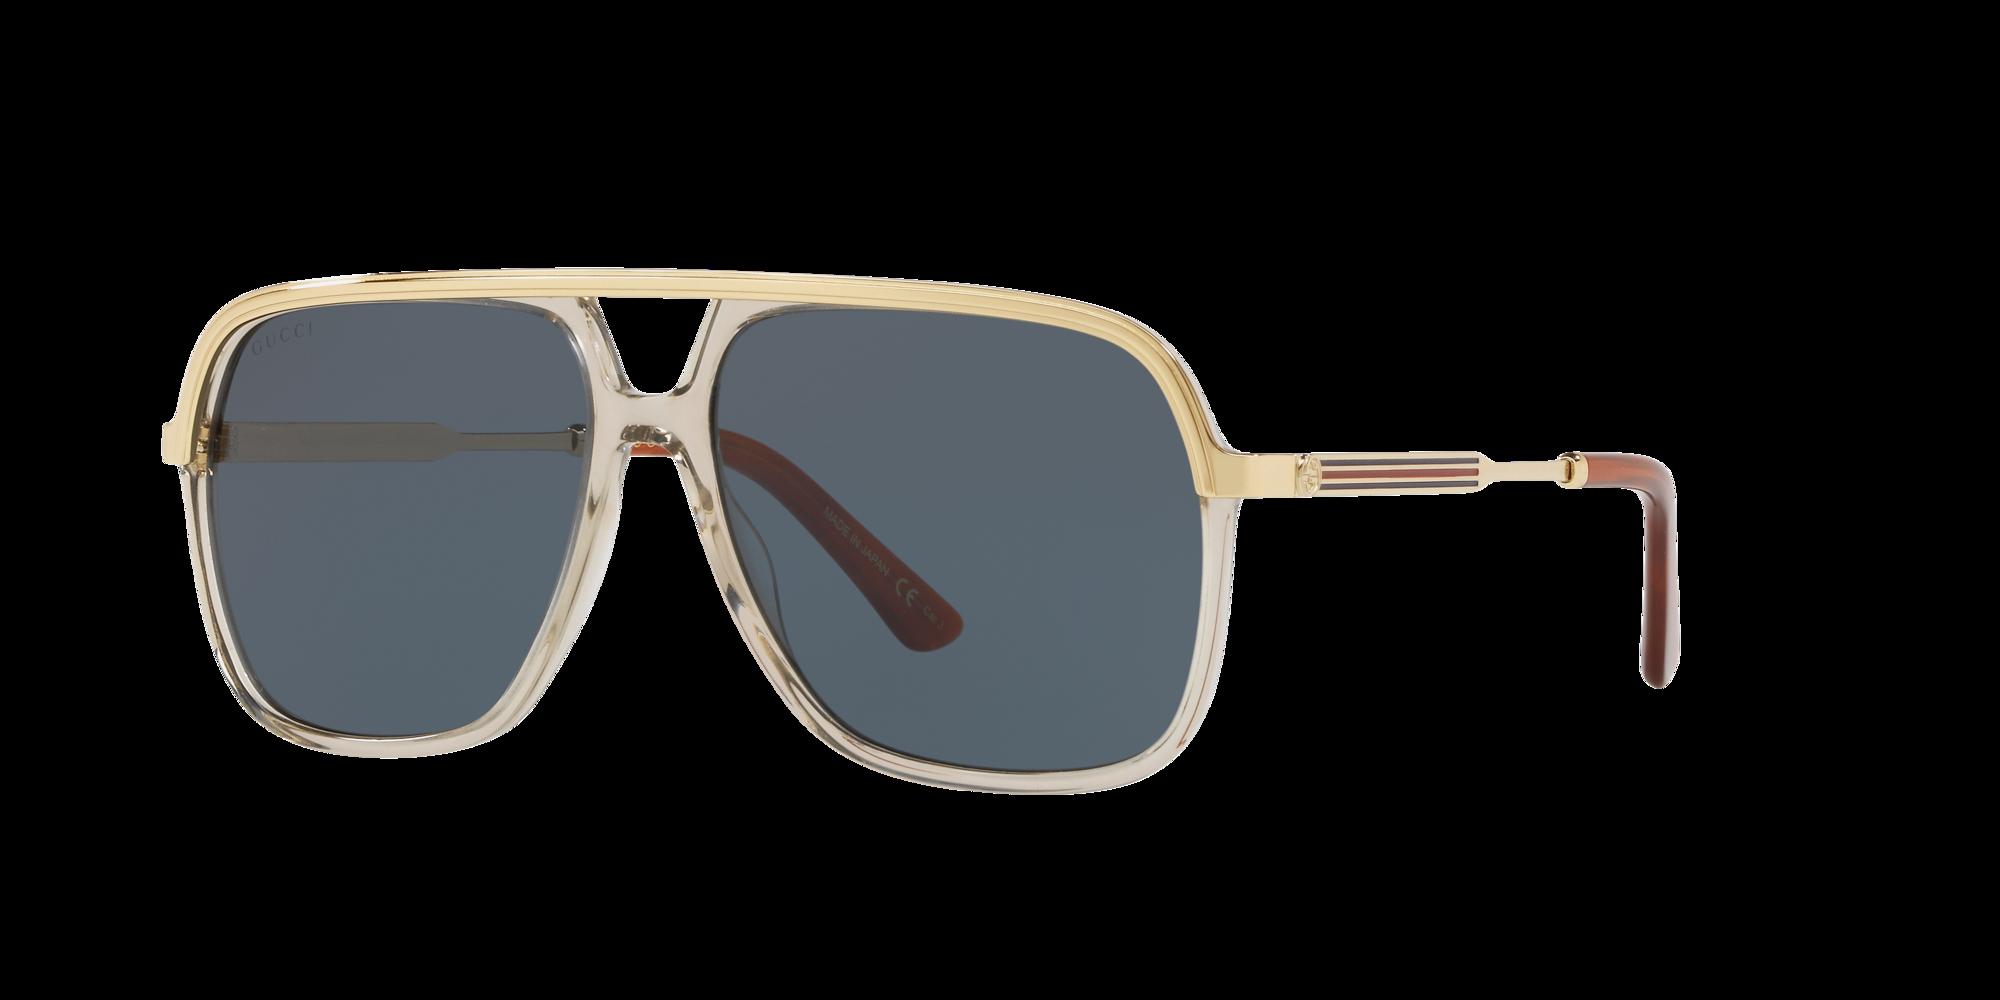 Gucci Unisex  GG0200S -  Frame color  Brown, Lens color  Blue, Size 57-14 145